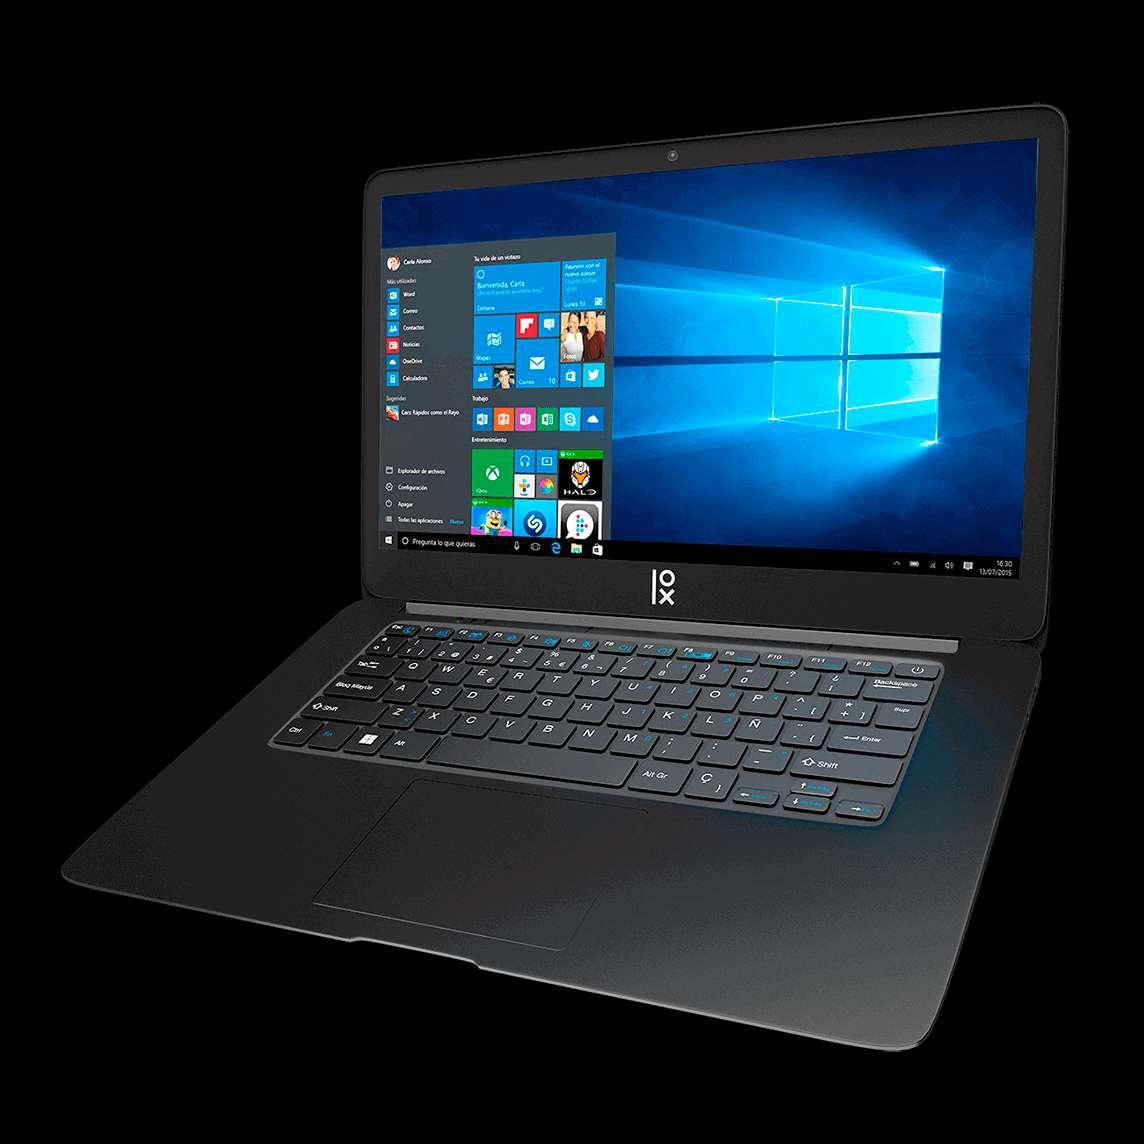 Imagen producto PC WINDOWS 10 3